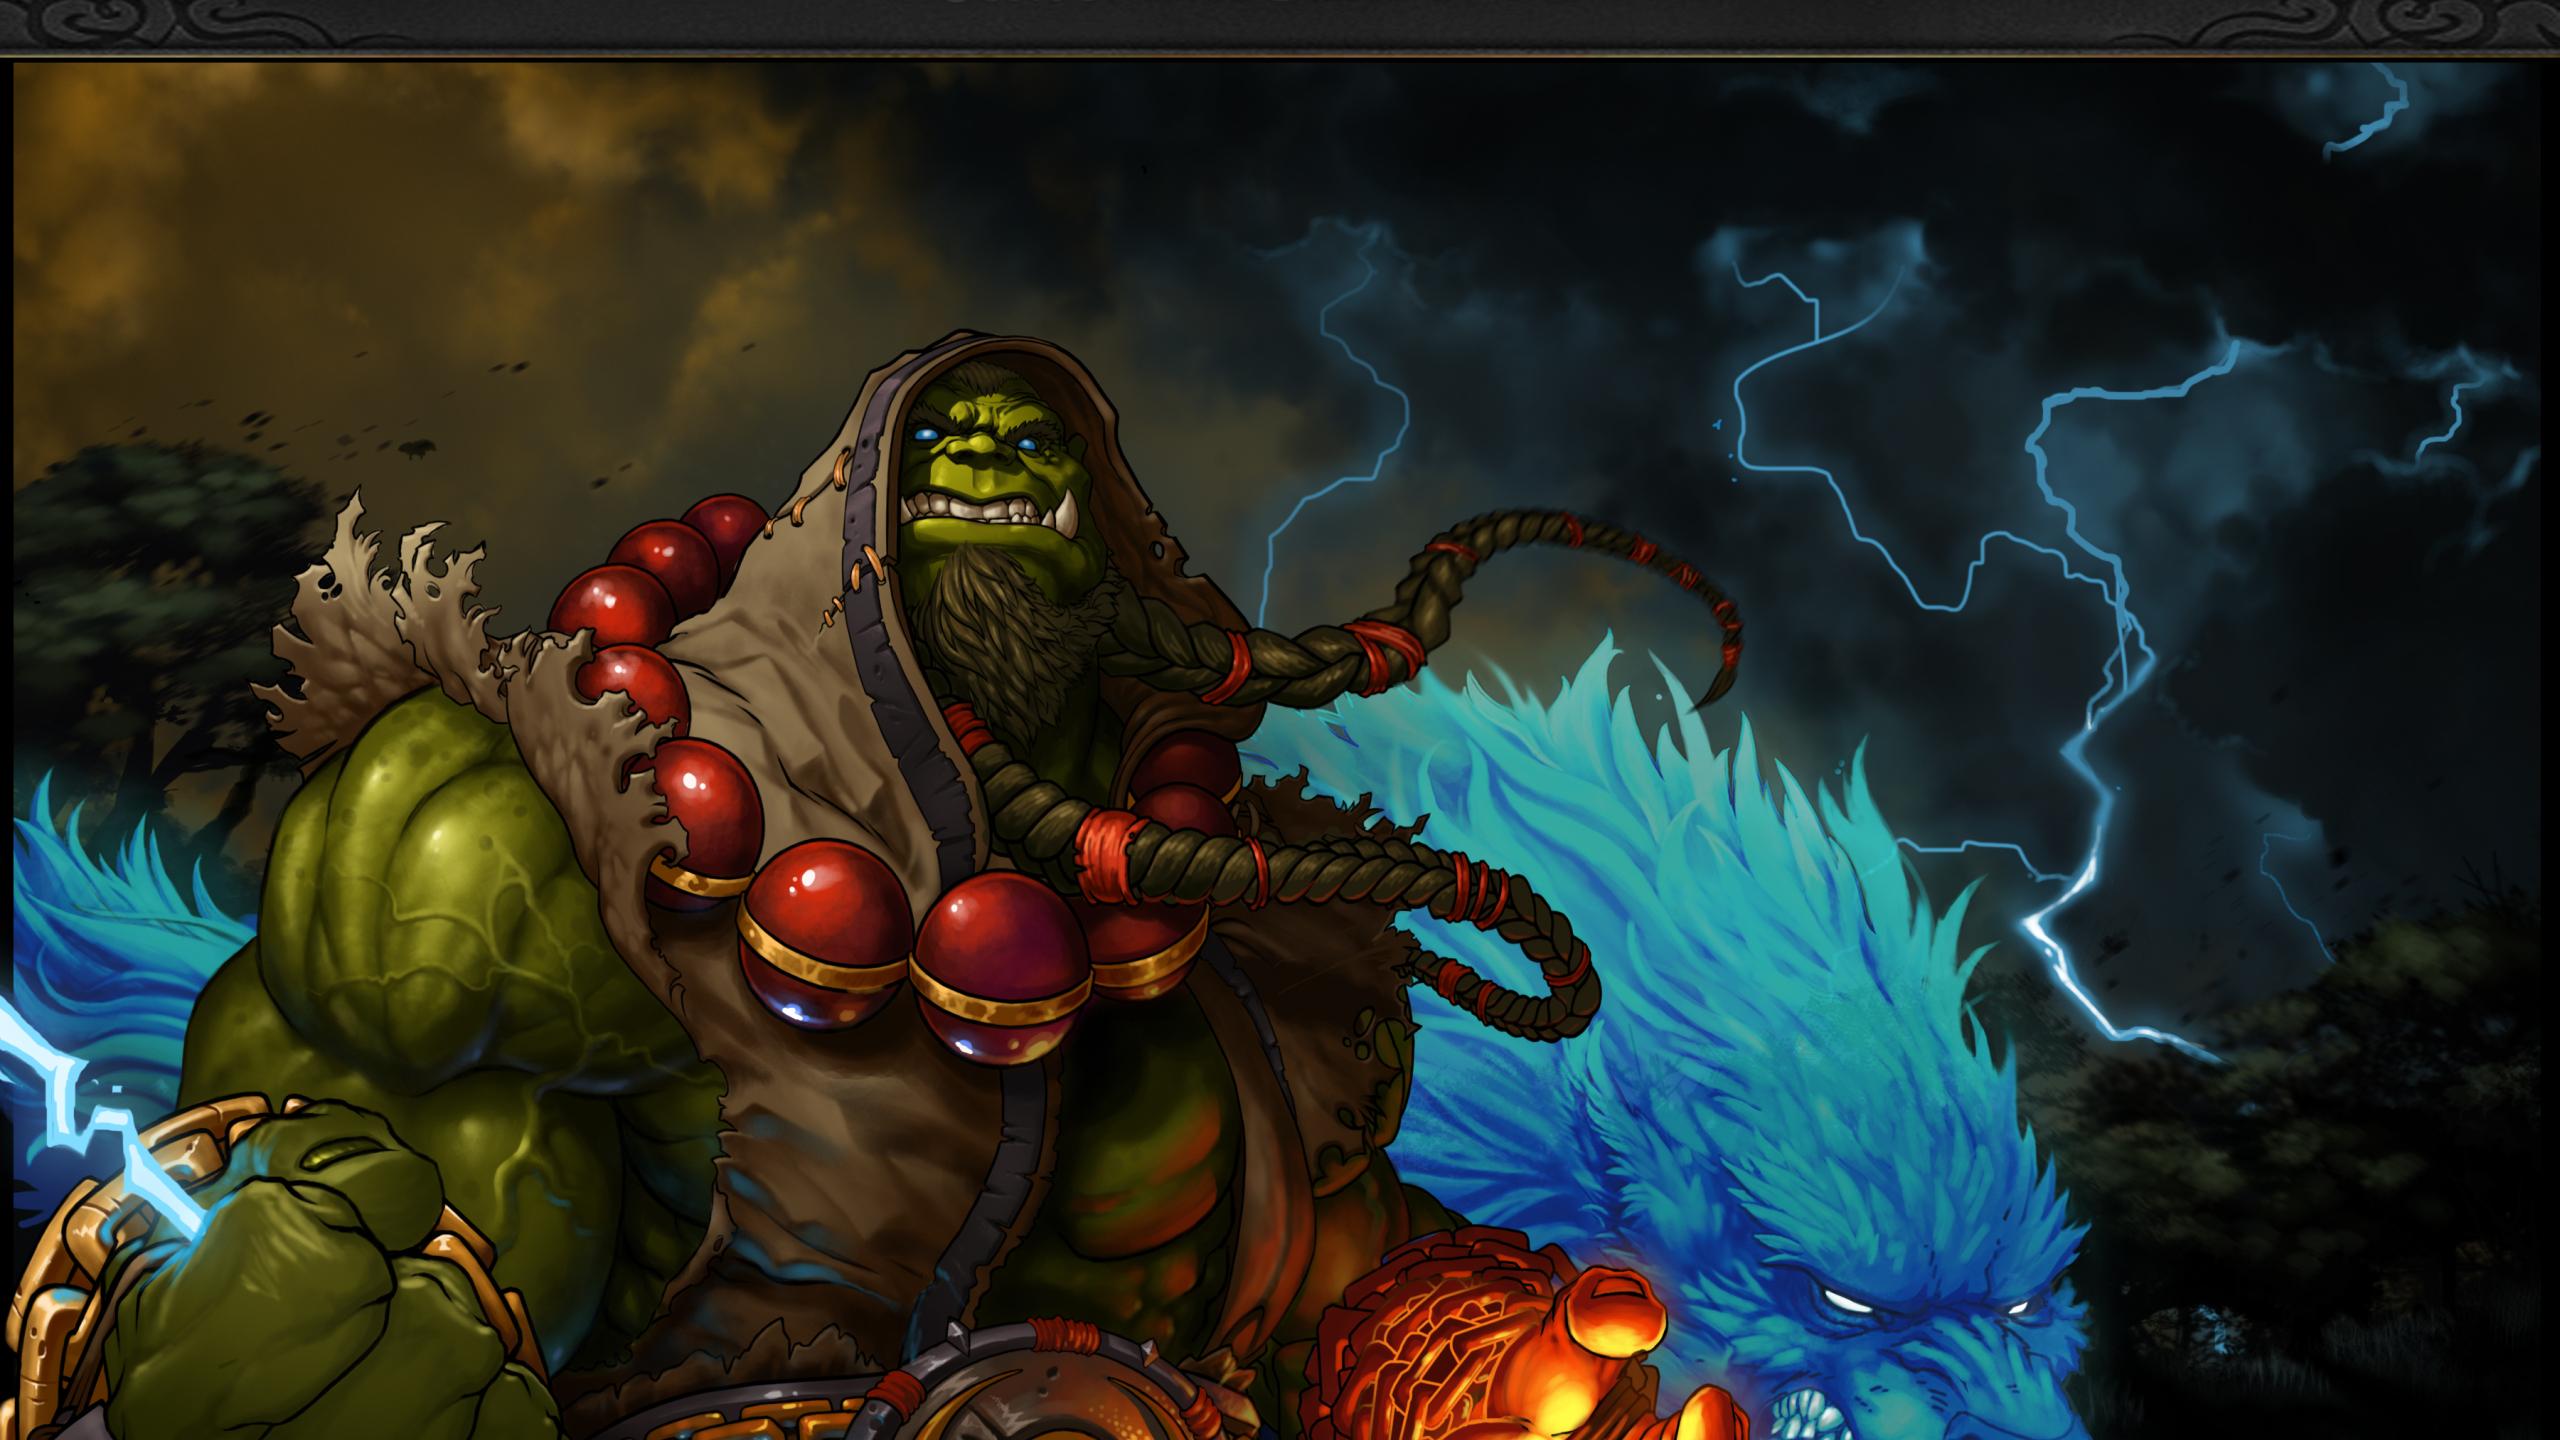 2560x1440 World Of Warcraft Shaman Thrall 1440p Resolution